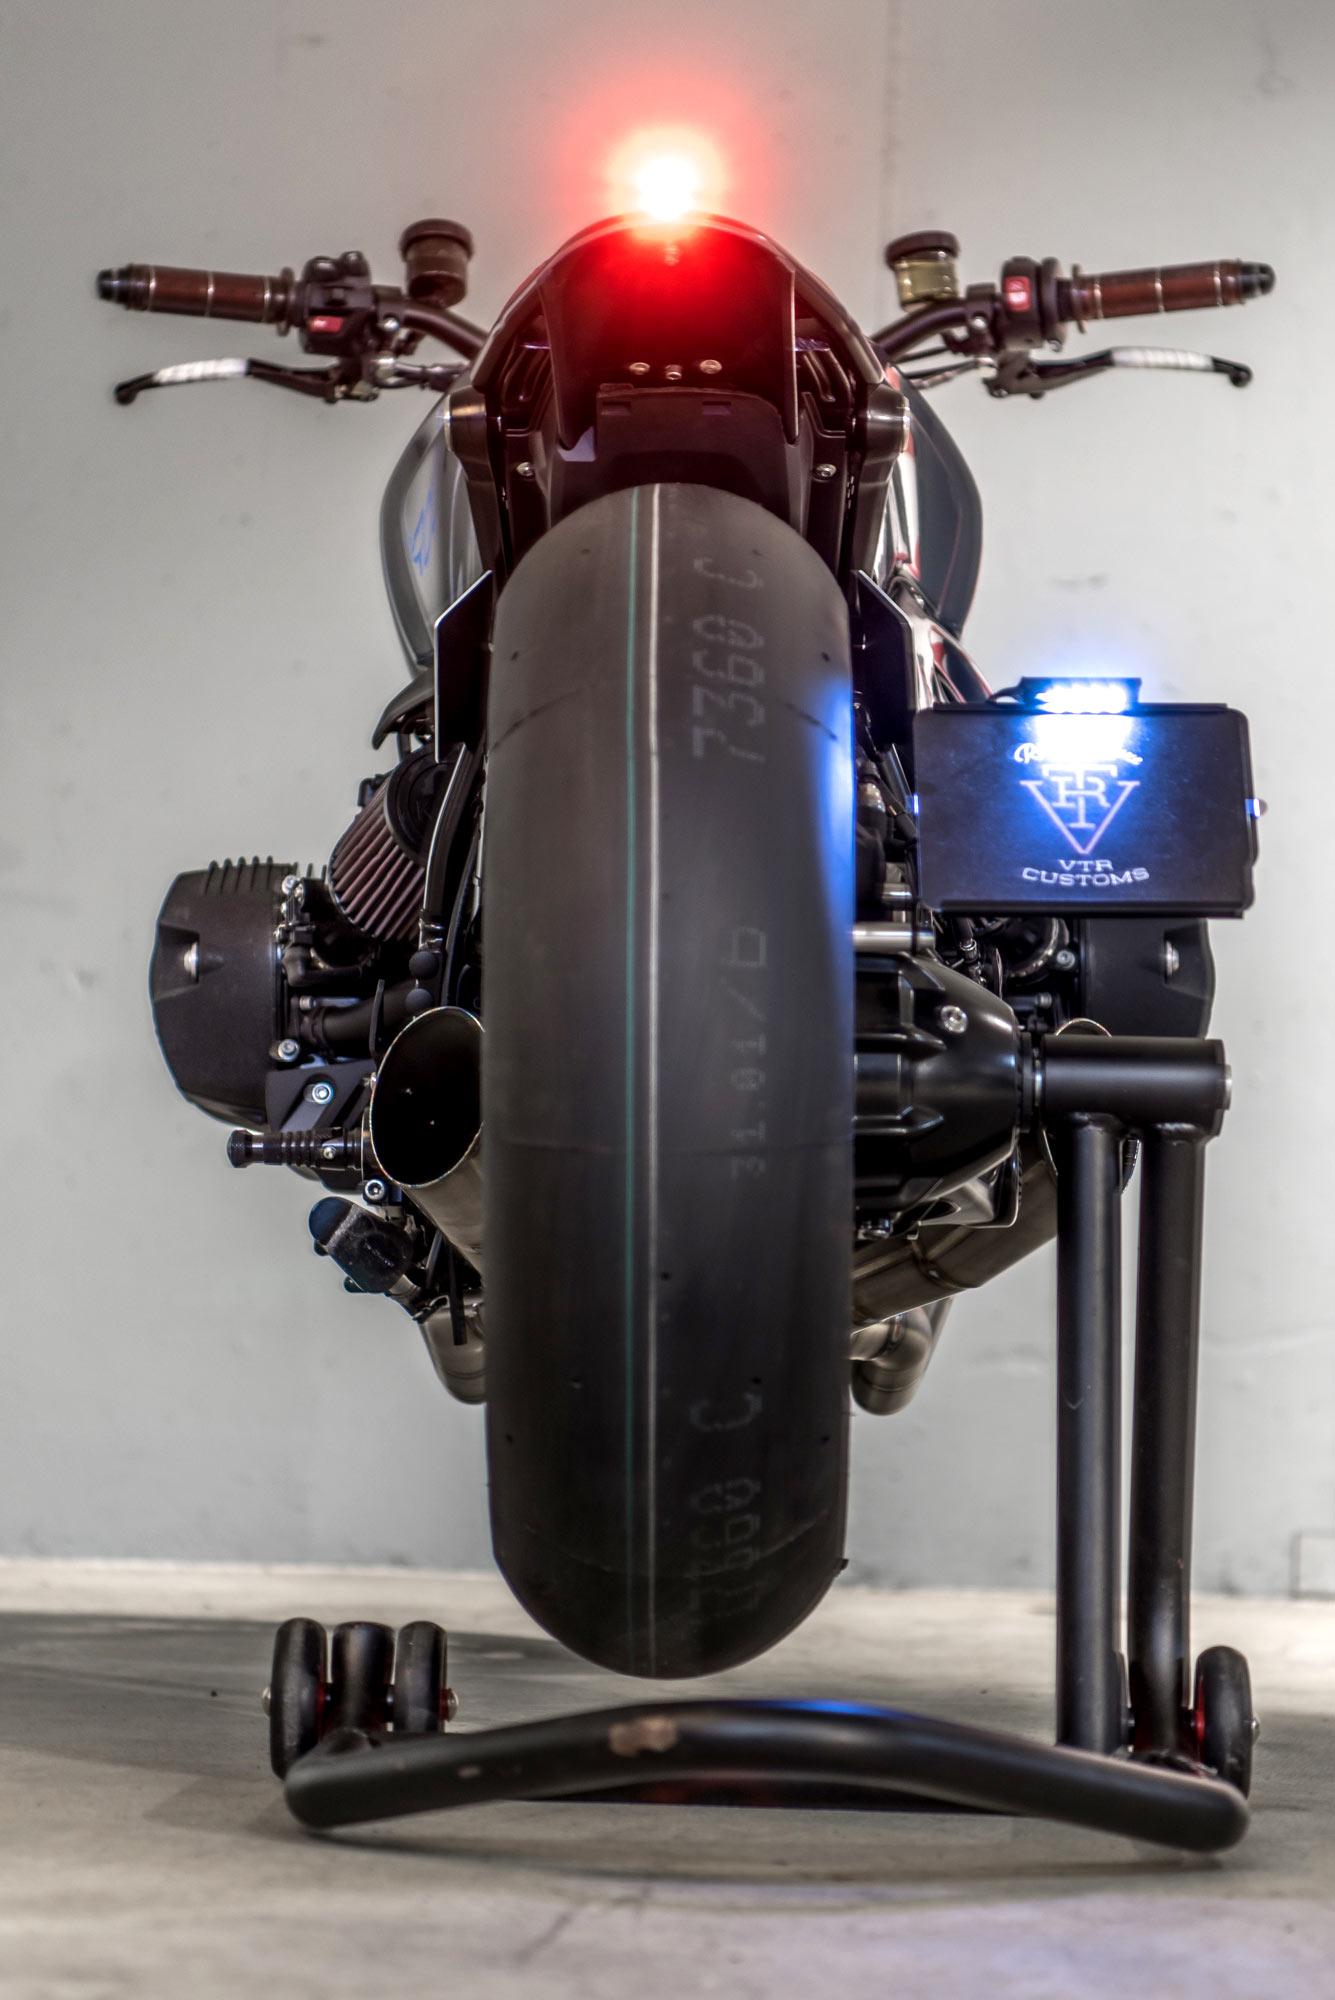 VTR_Customs_ST33_BMW_R9T_Tracker_BIGS_10.jpg